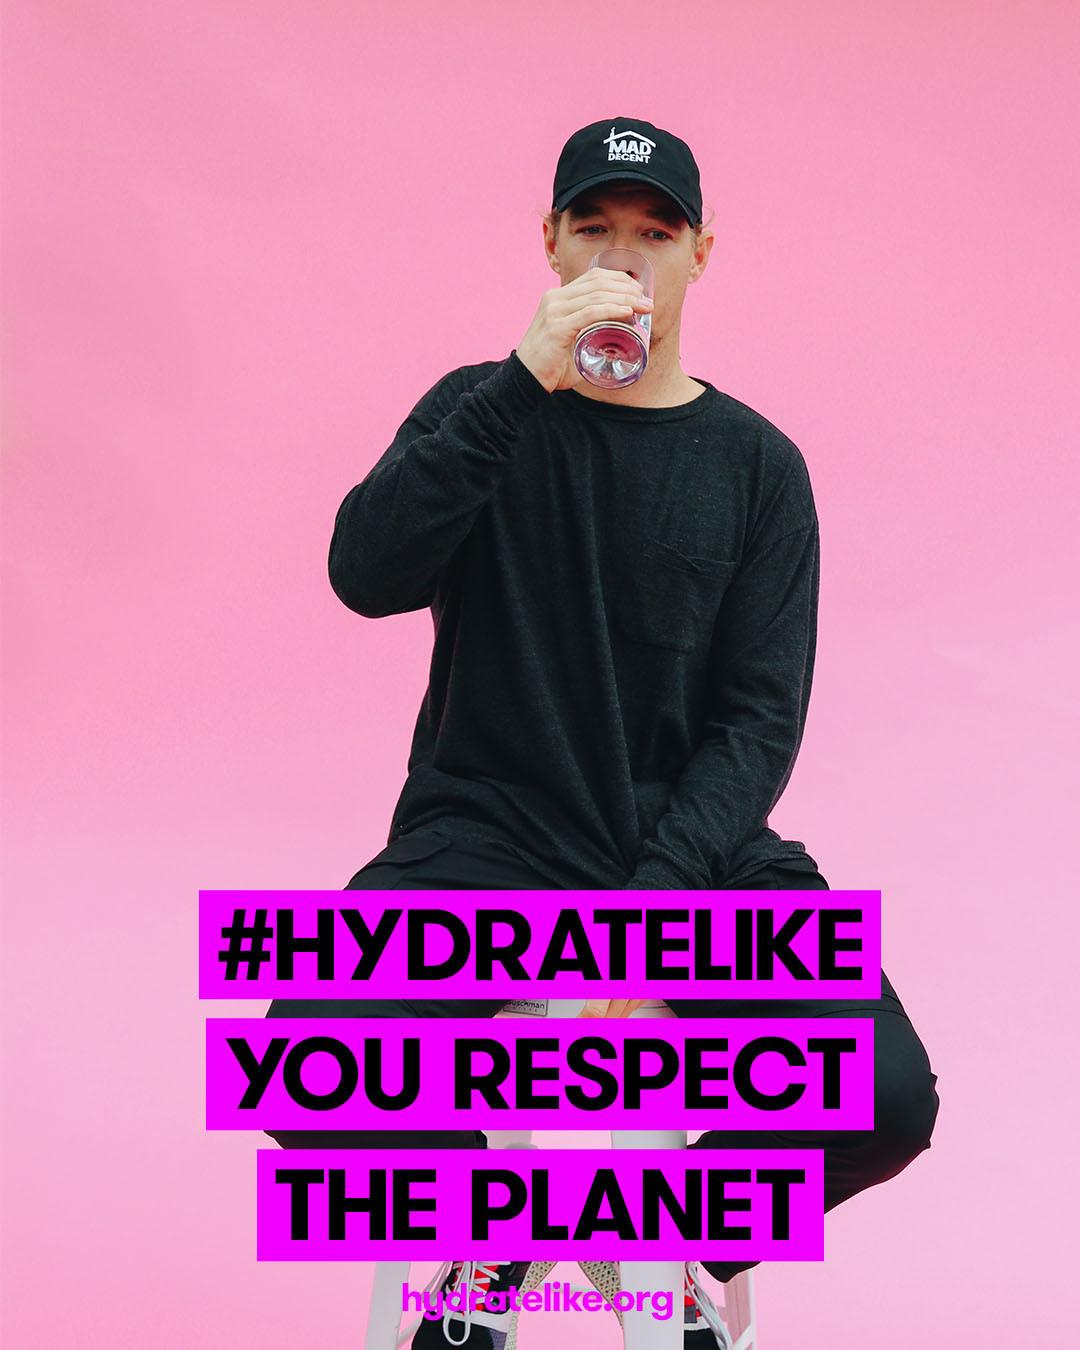 Hydrate Like Diplo